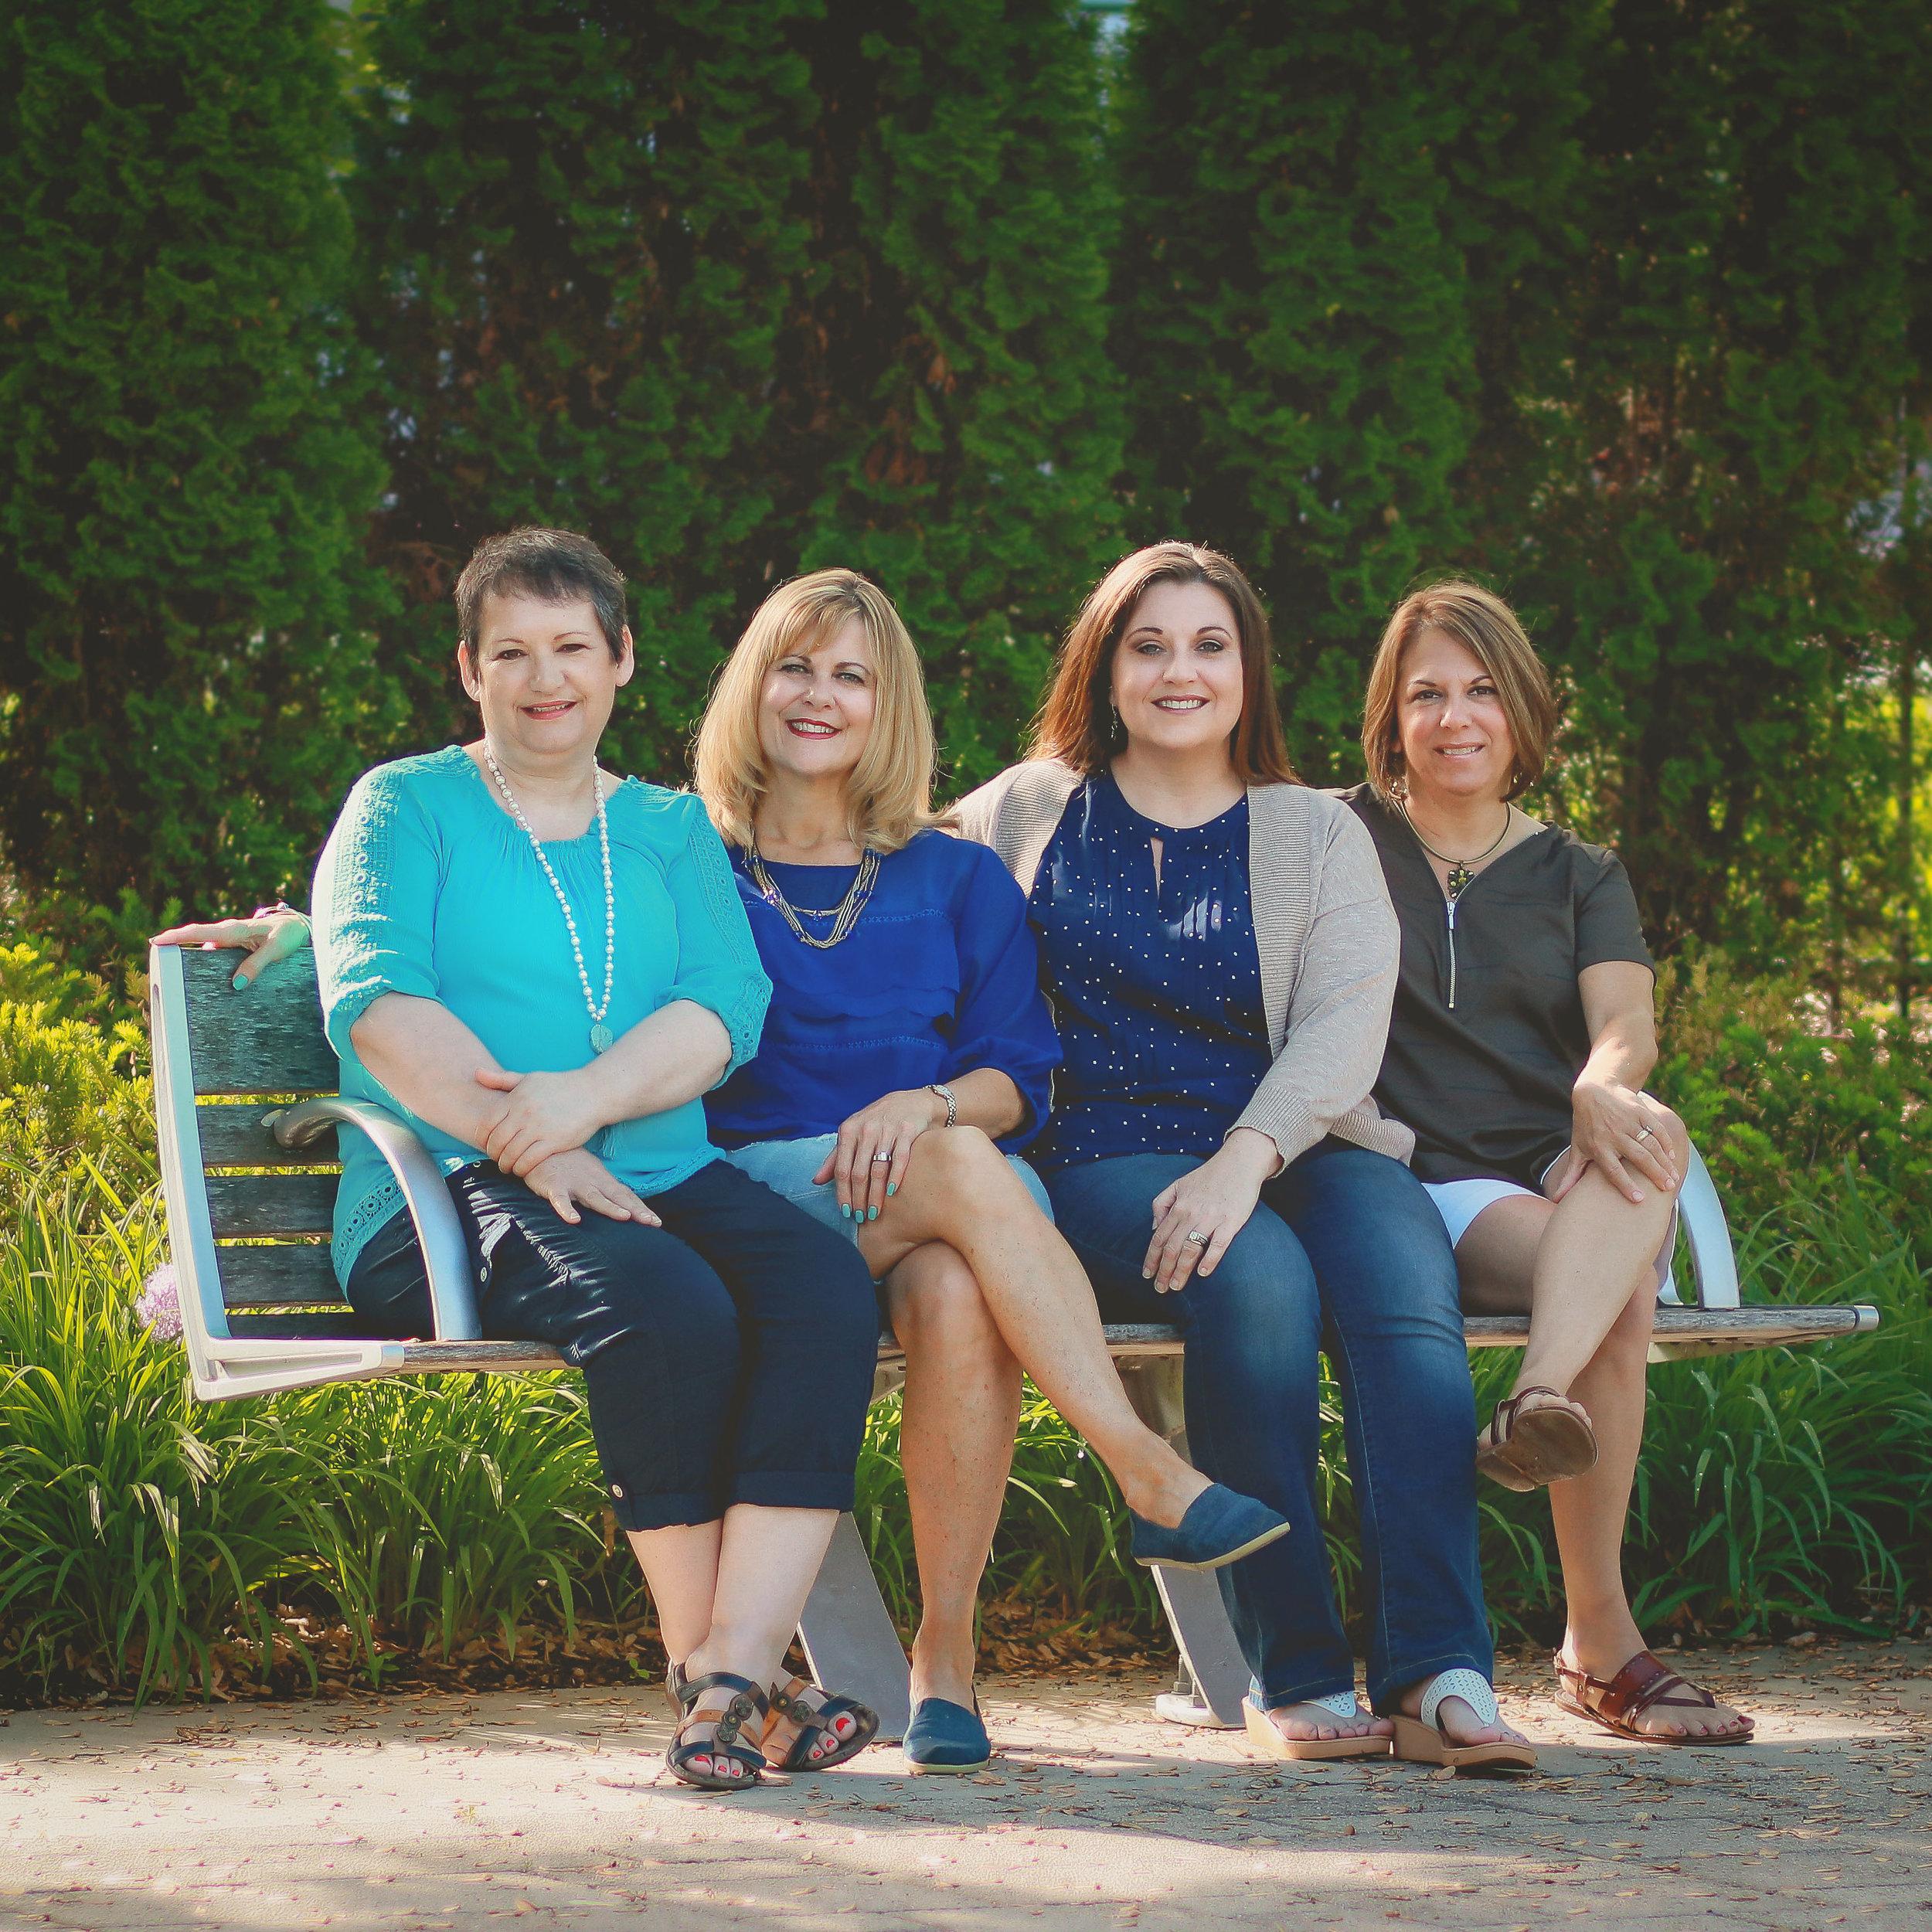 Ministry Team (Left to Right): Lisa Ring, Jenny Spontak, Jess Olivito, Dee Everson